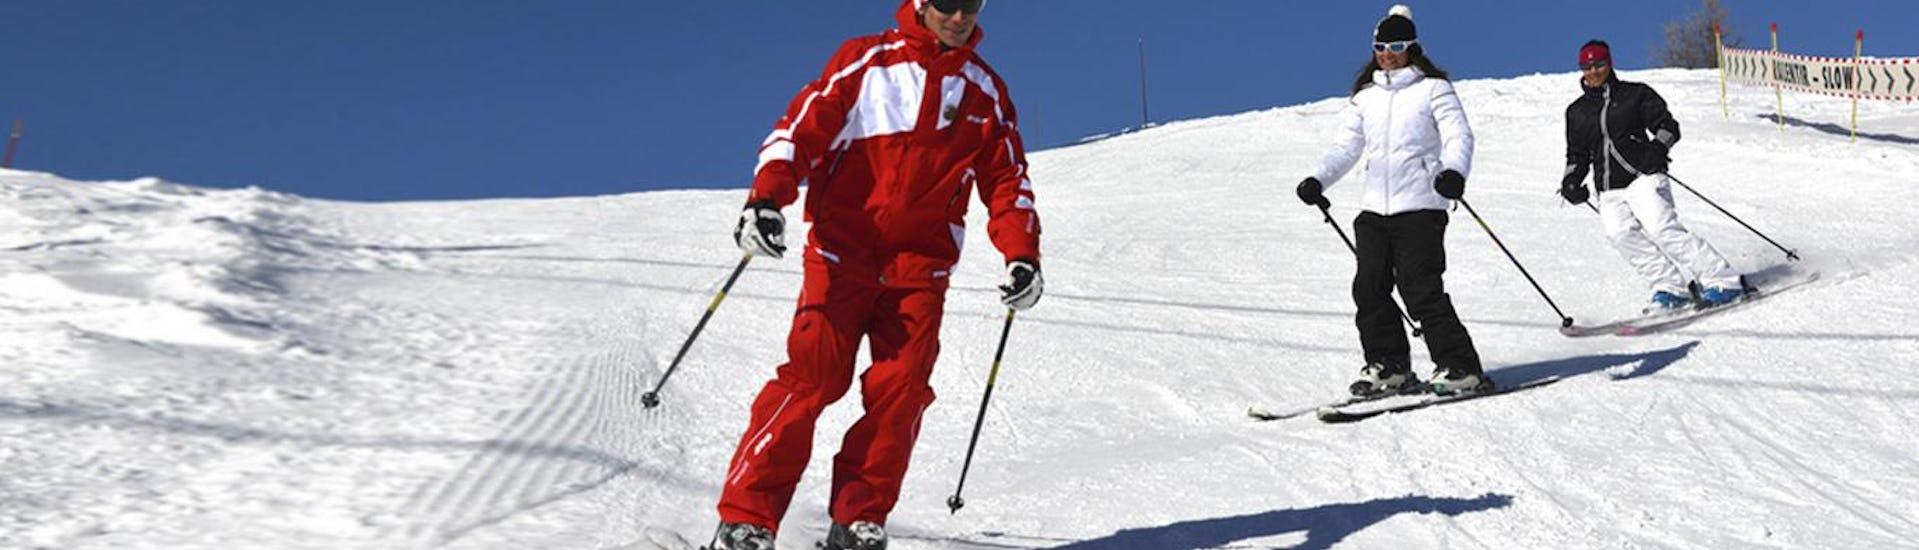 Ski Lessons for Teens & Adults - Morning - Beginner